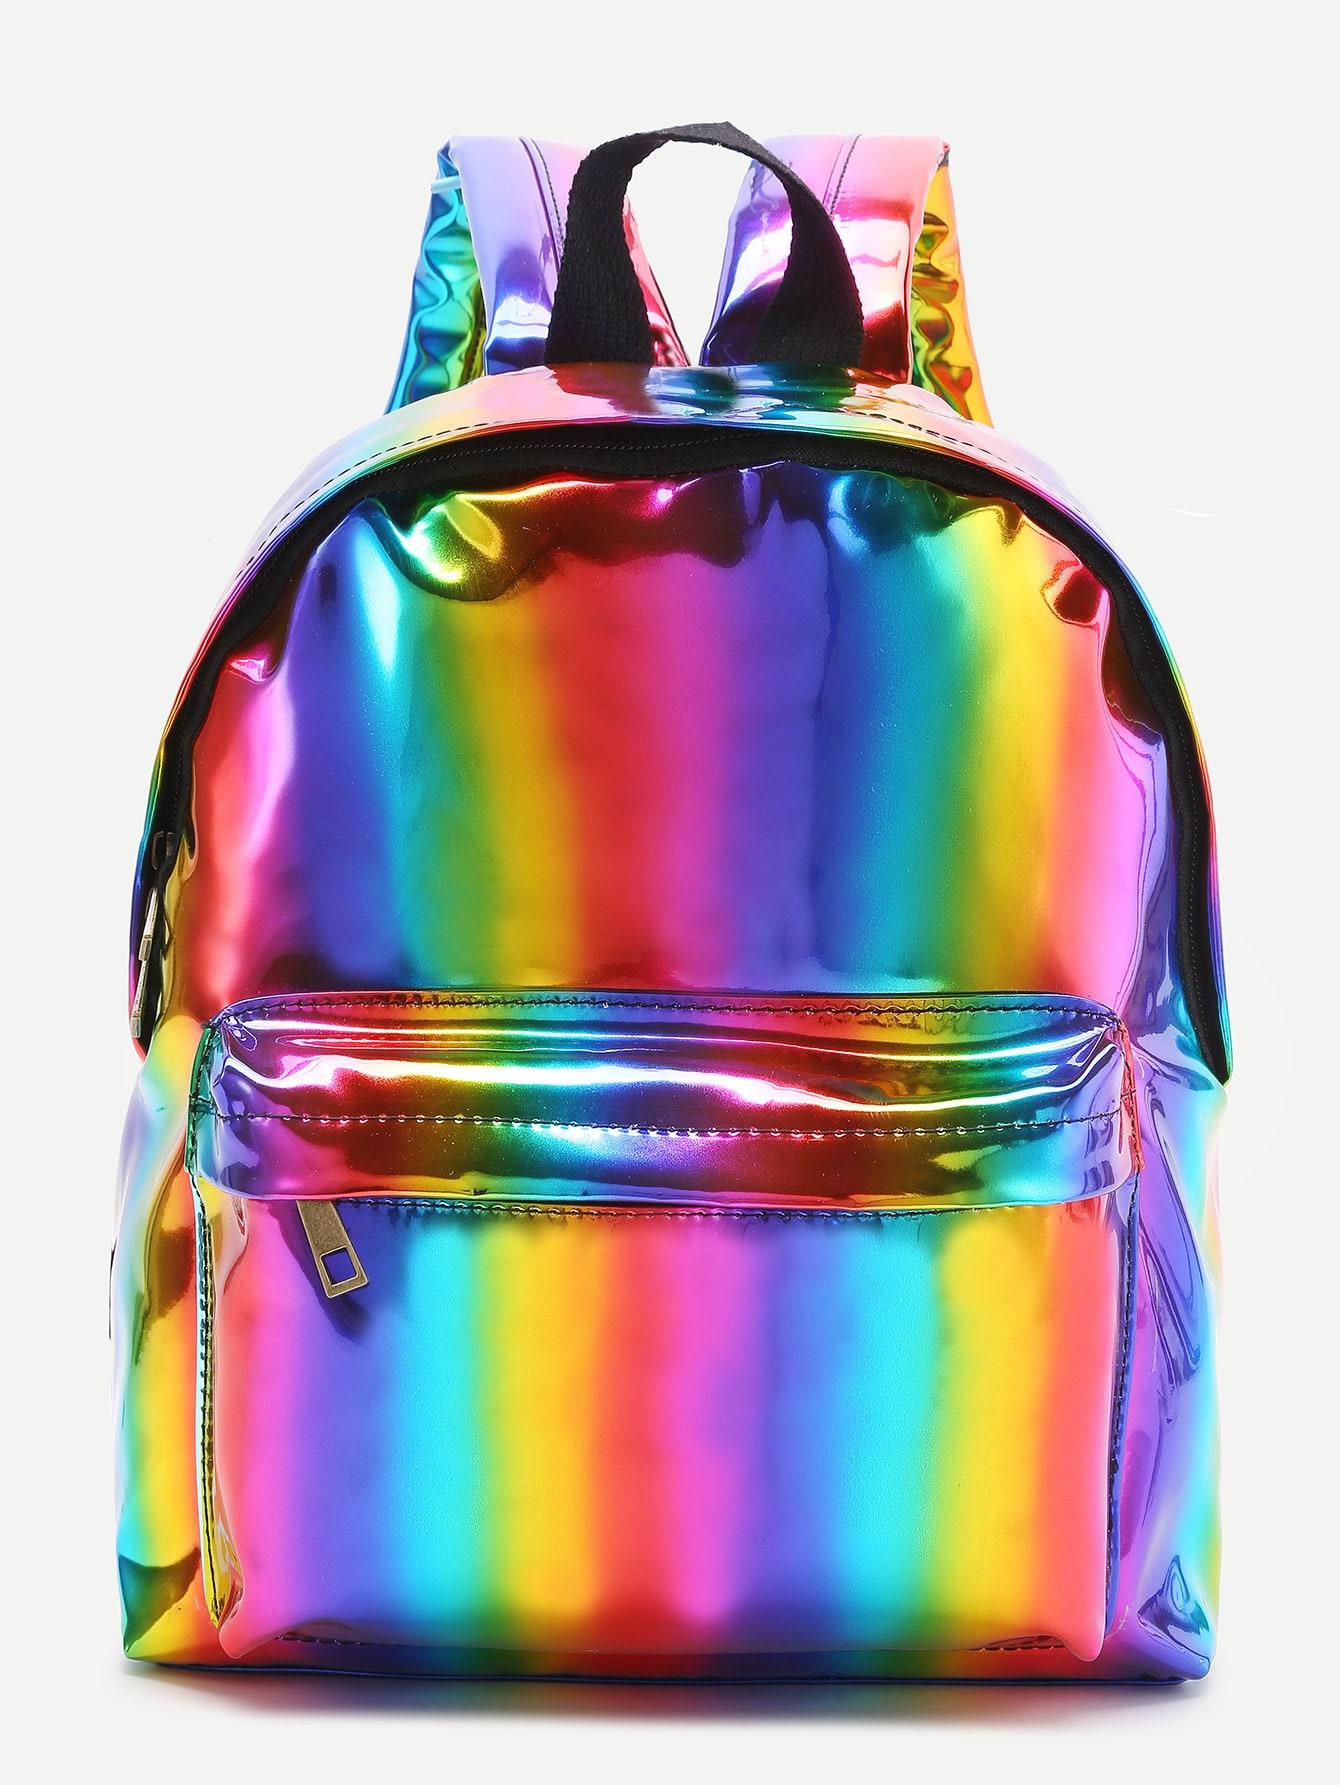 bag170315912_1